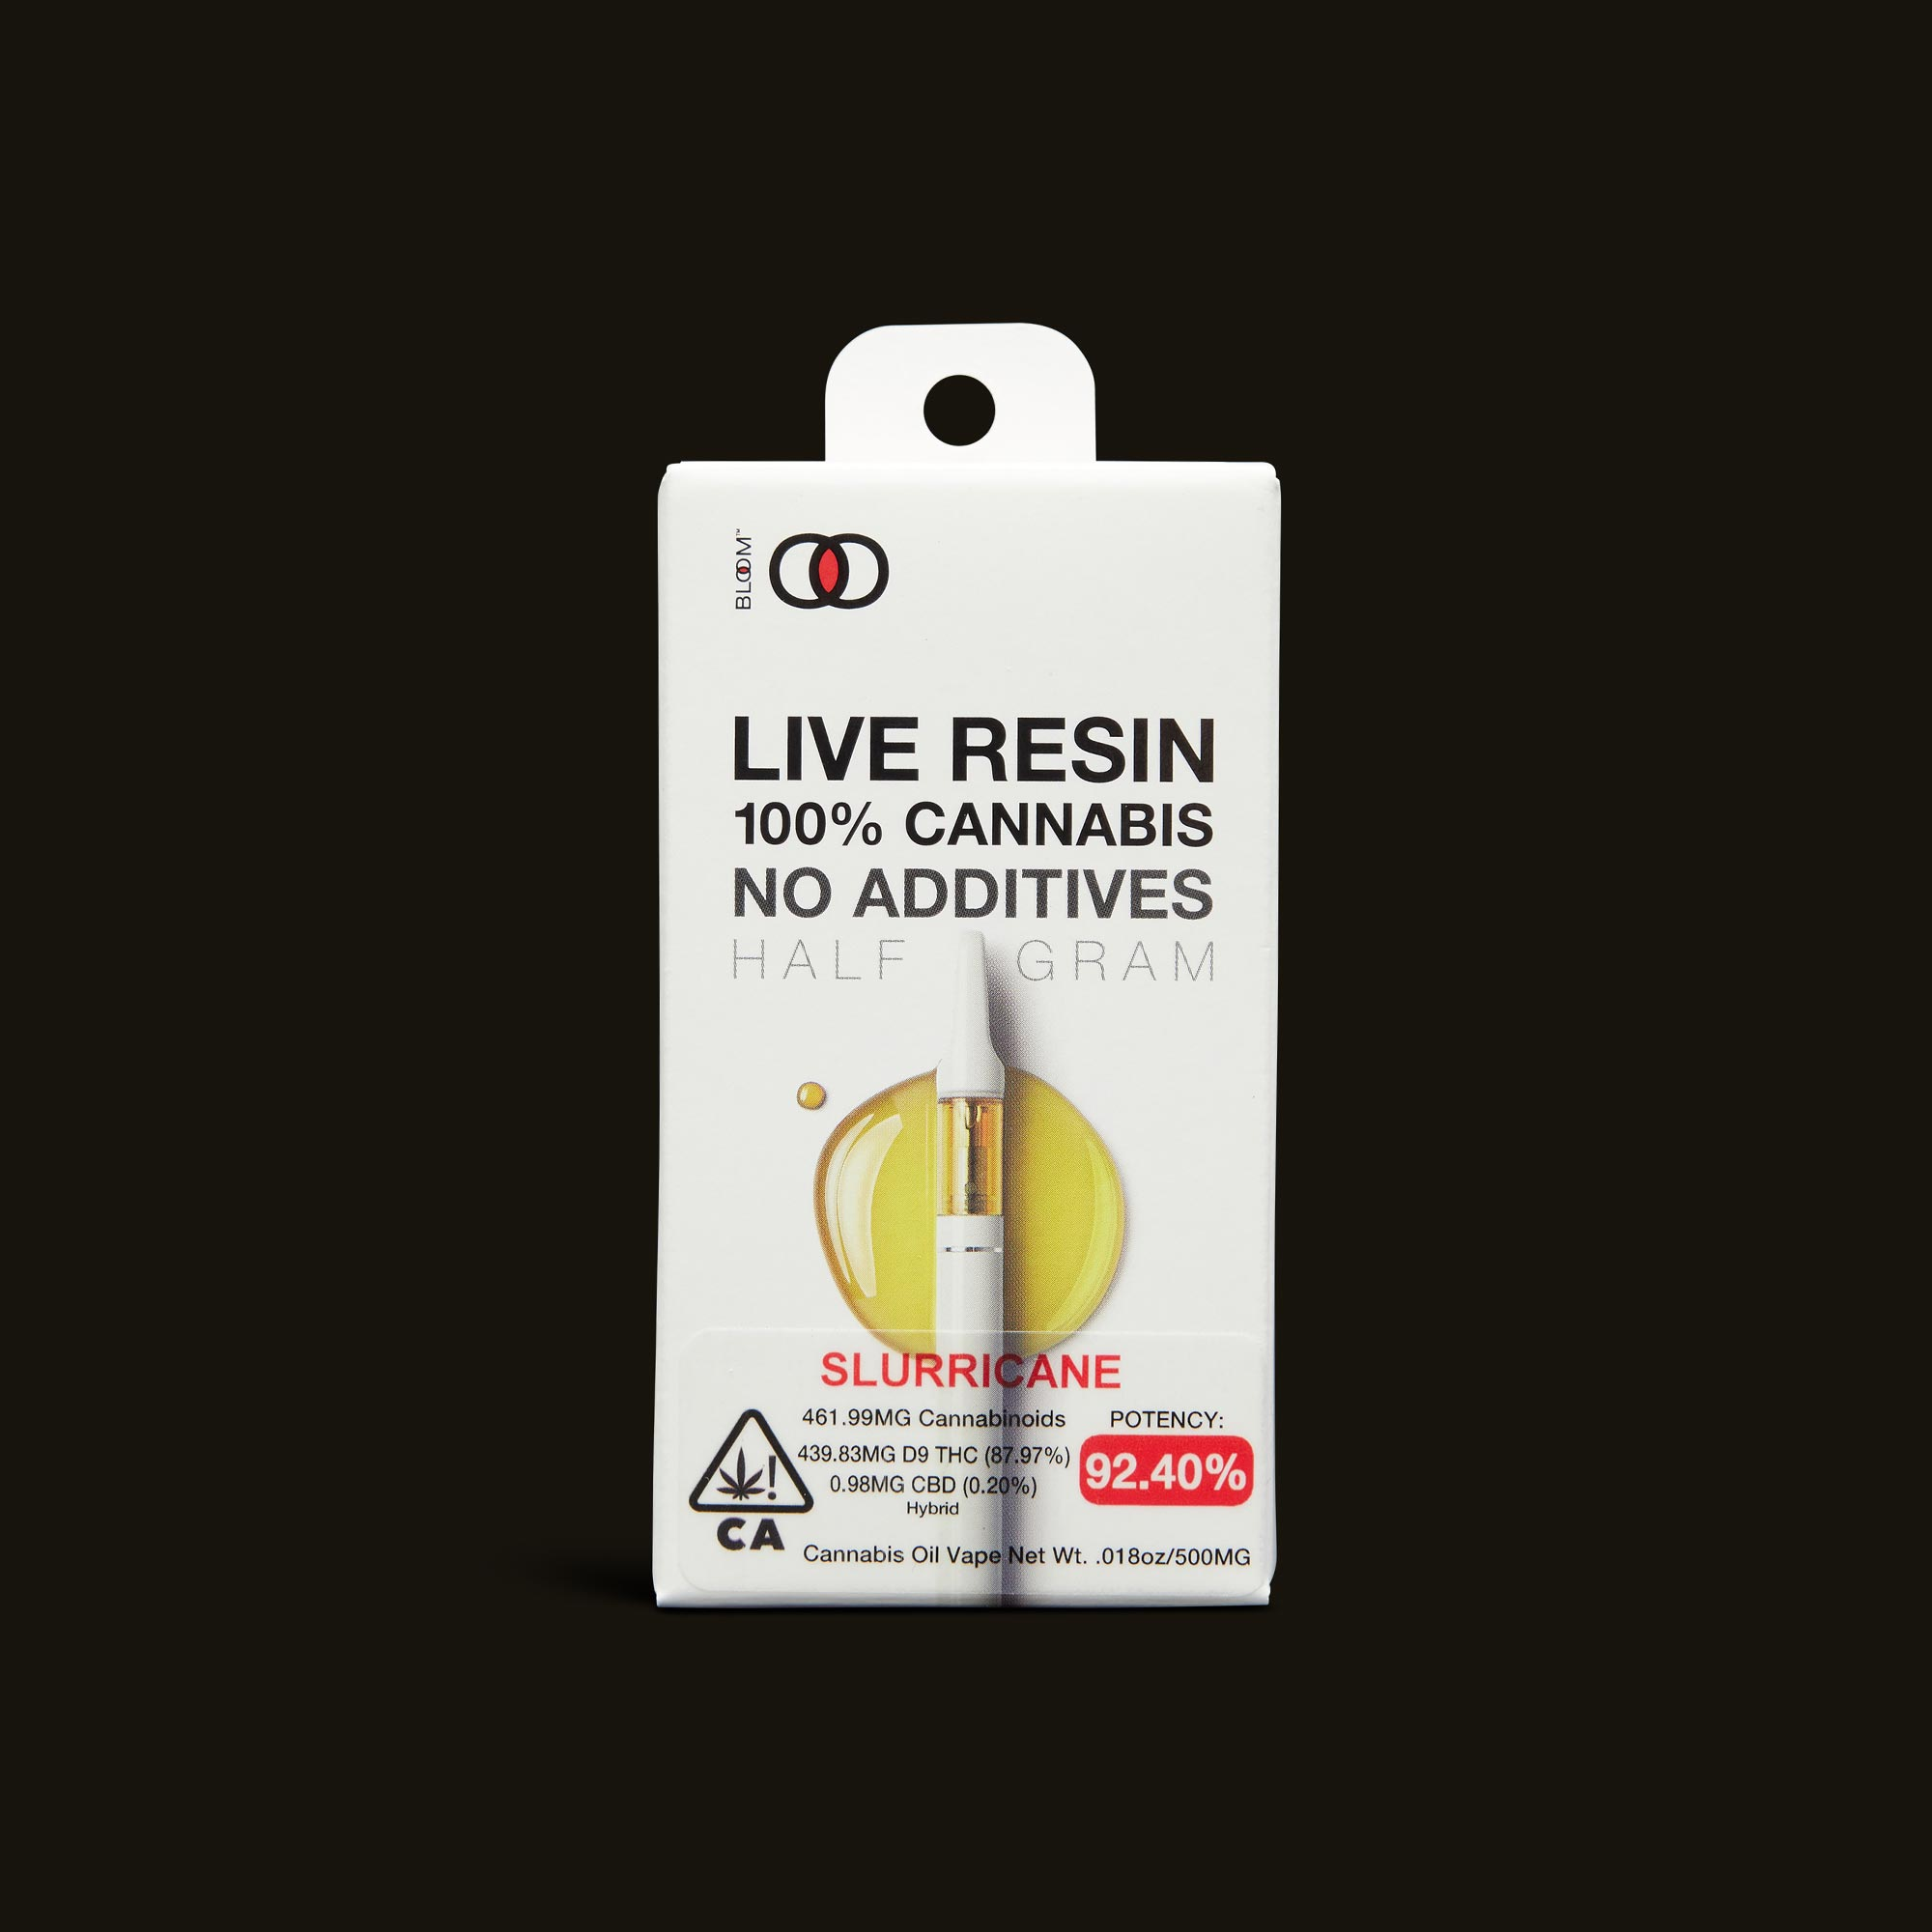 Slurricane Live Resin Cartridge - 1g - 1g cartridge